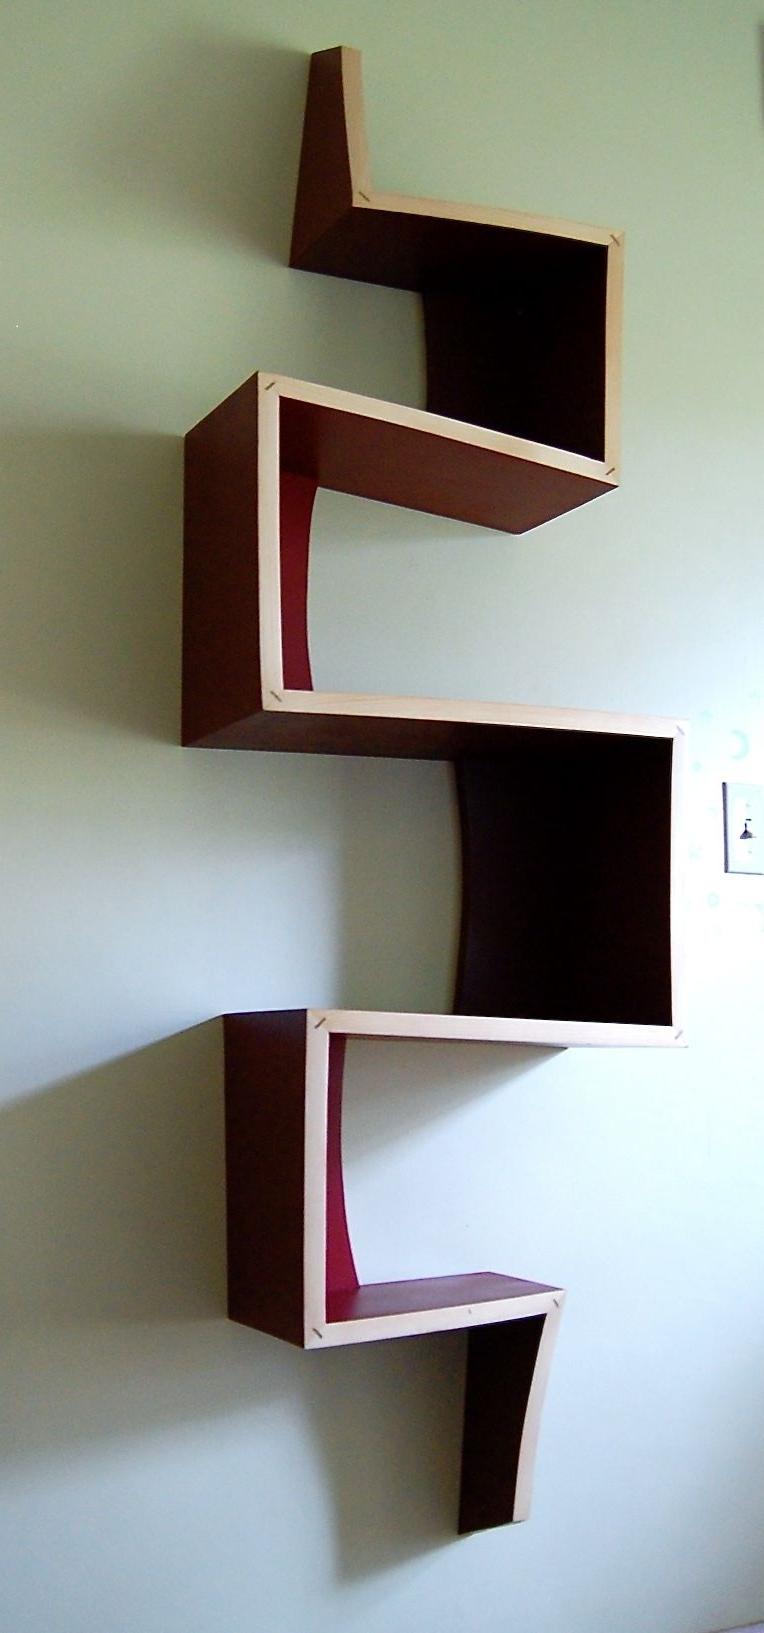 Trendy Zig Zag Bookcases With Regard To 56 Zig Zag Book Shelf, Book Display Shelf Zig Zag Diy Zig Zag (View 3 of 15)